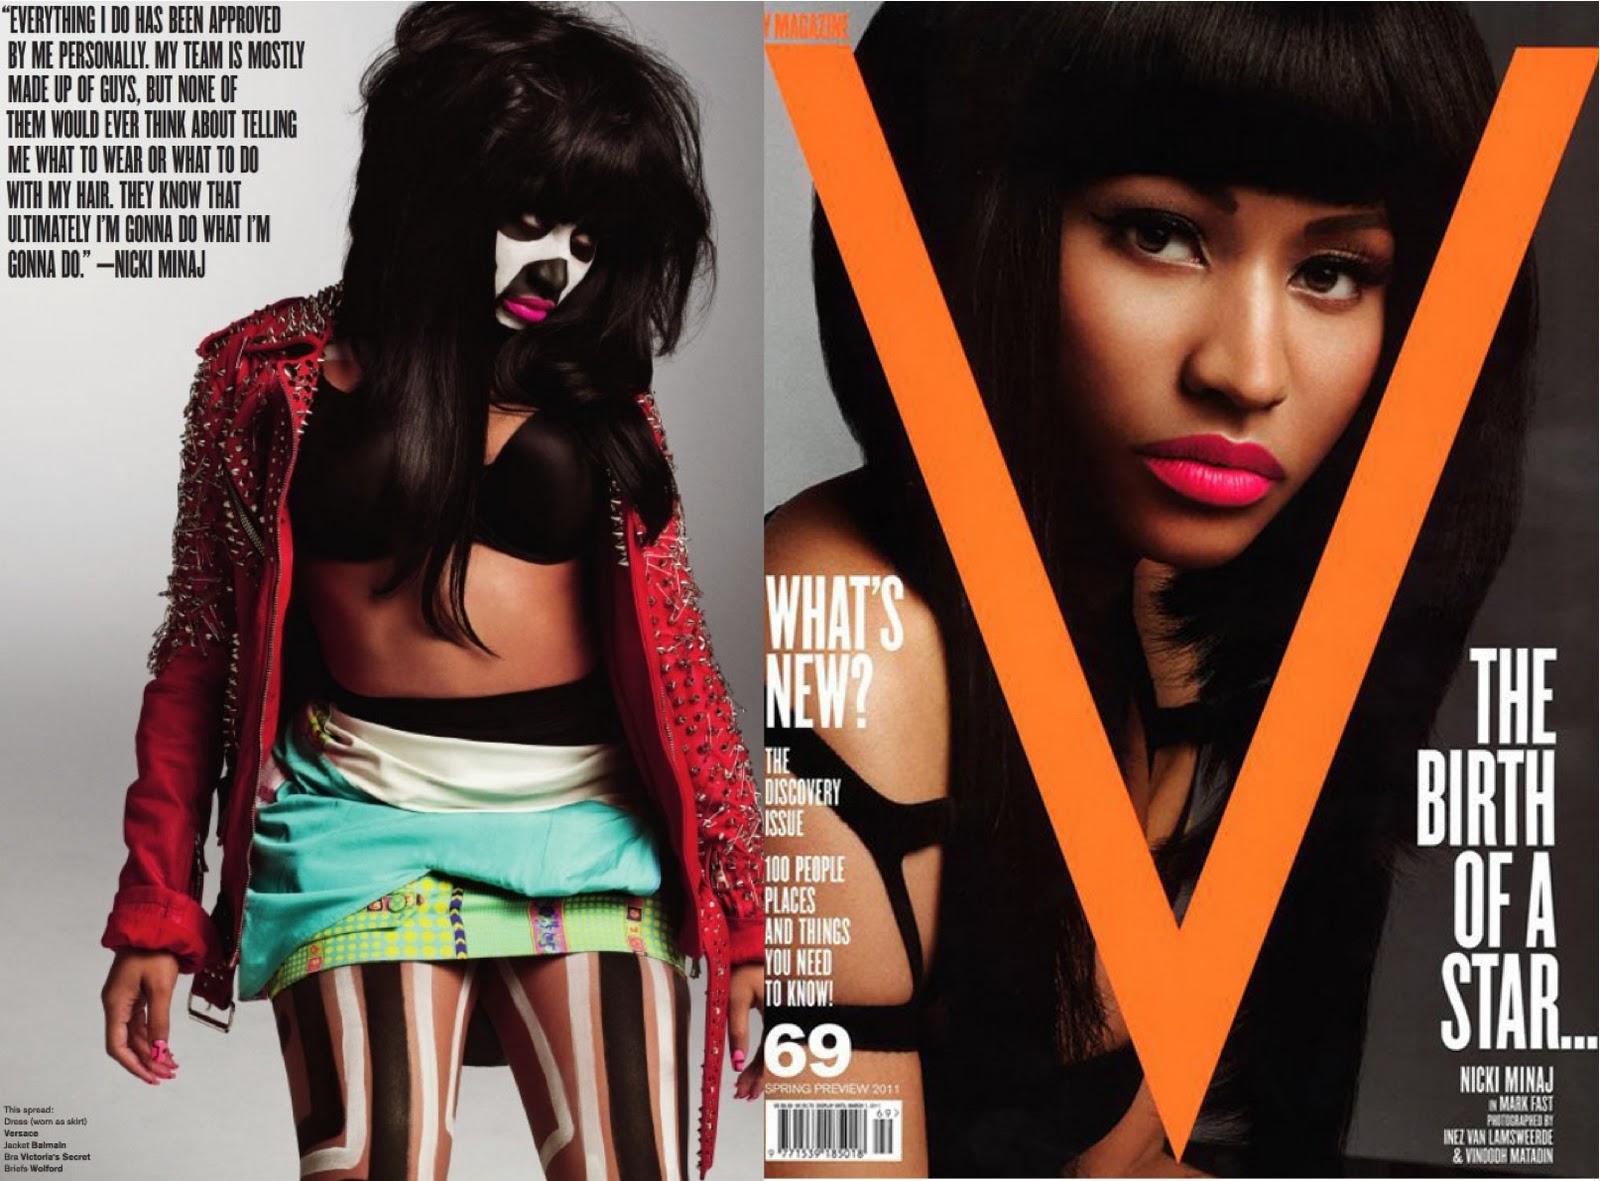 http://1.bp.blogspot.com/_PfmV3qvy8FY/TS_W_Njn7nI/AAAAAAAAA8k/YehXTKFRvDY/s1600/la+modella+mafia+Nicki+Minaj+photographed+by+Inez+%2526+Vinoodh+for+V+Magazine+%252369.jpg